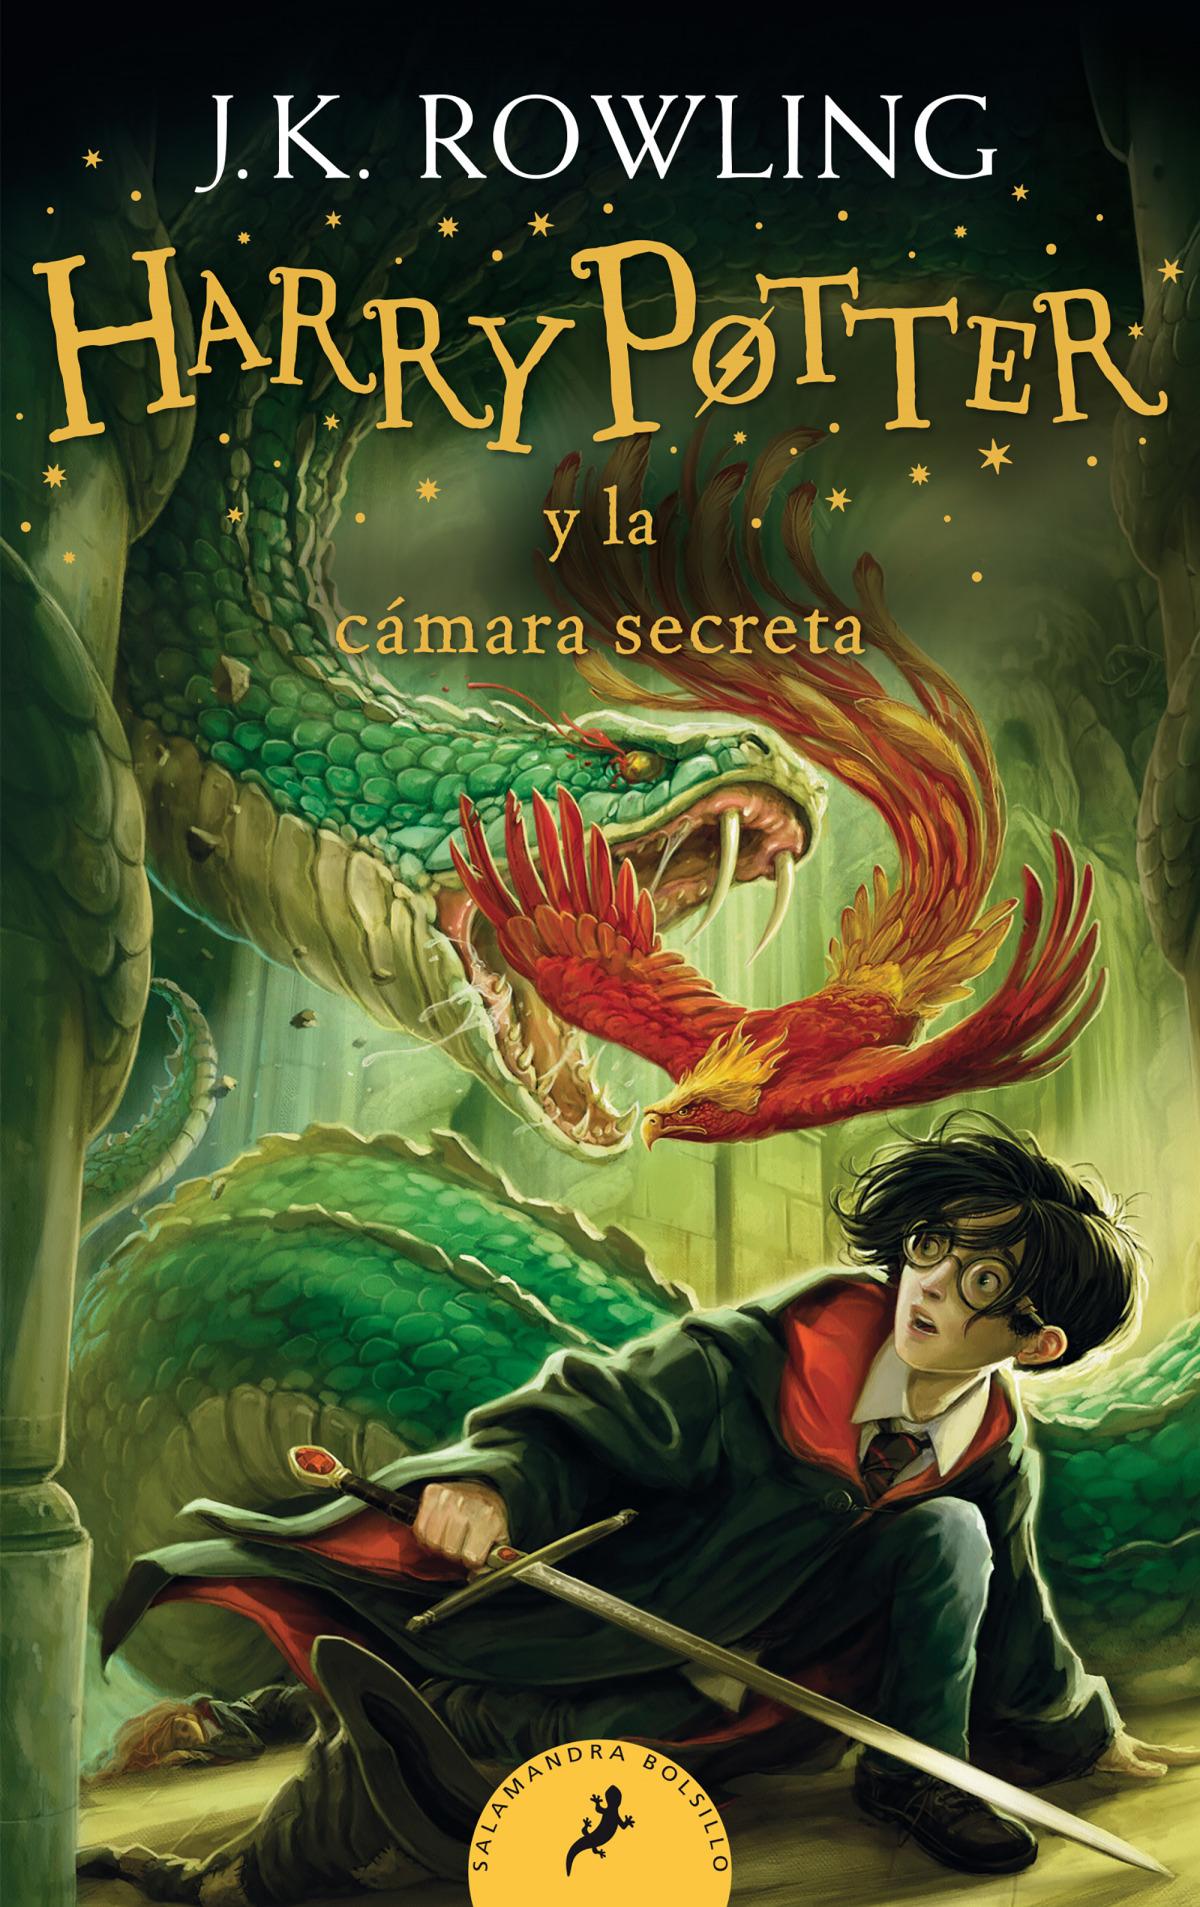 Harry Potter y la cámara secreta (Harry Potter 2) 9788418173127